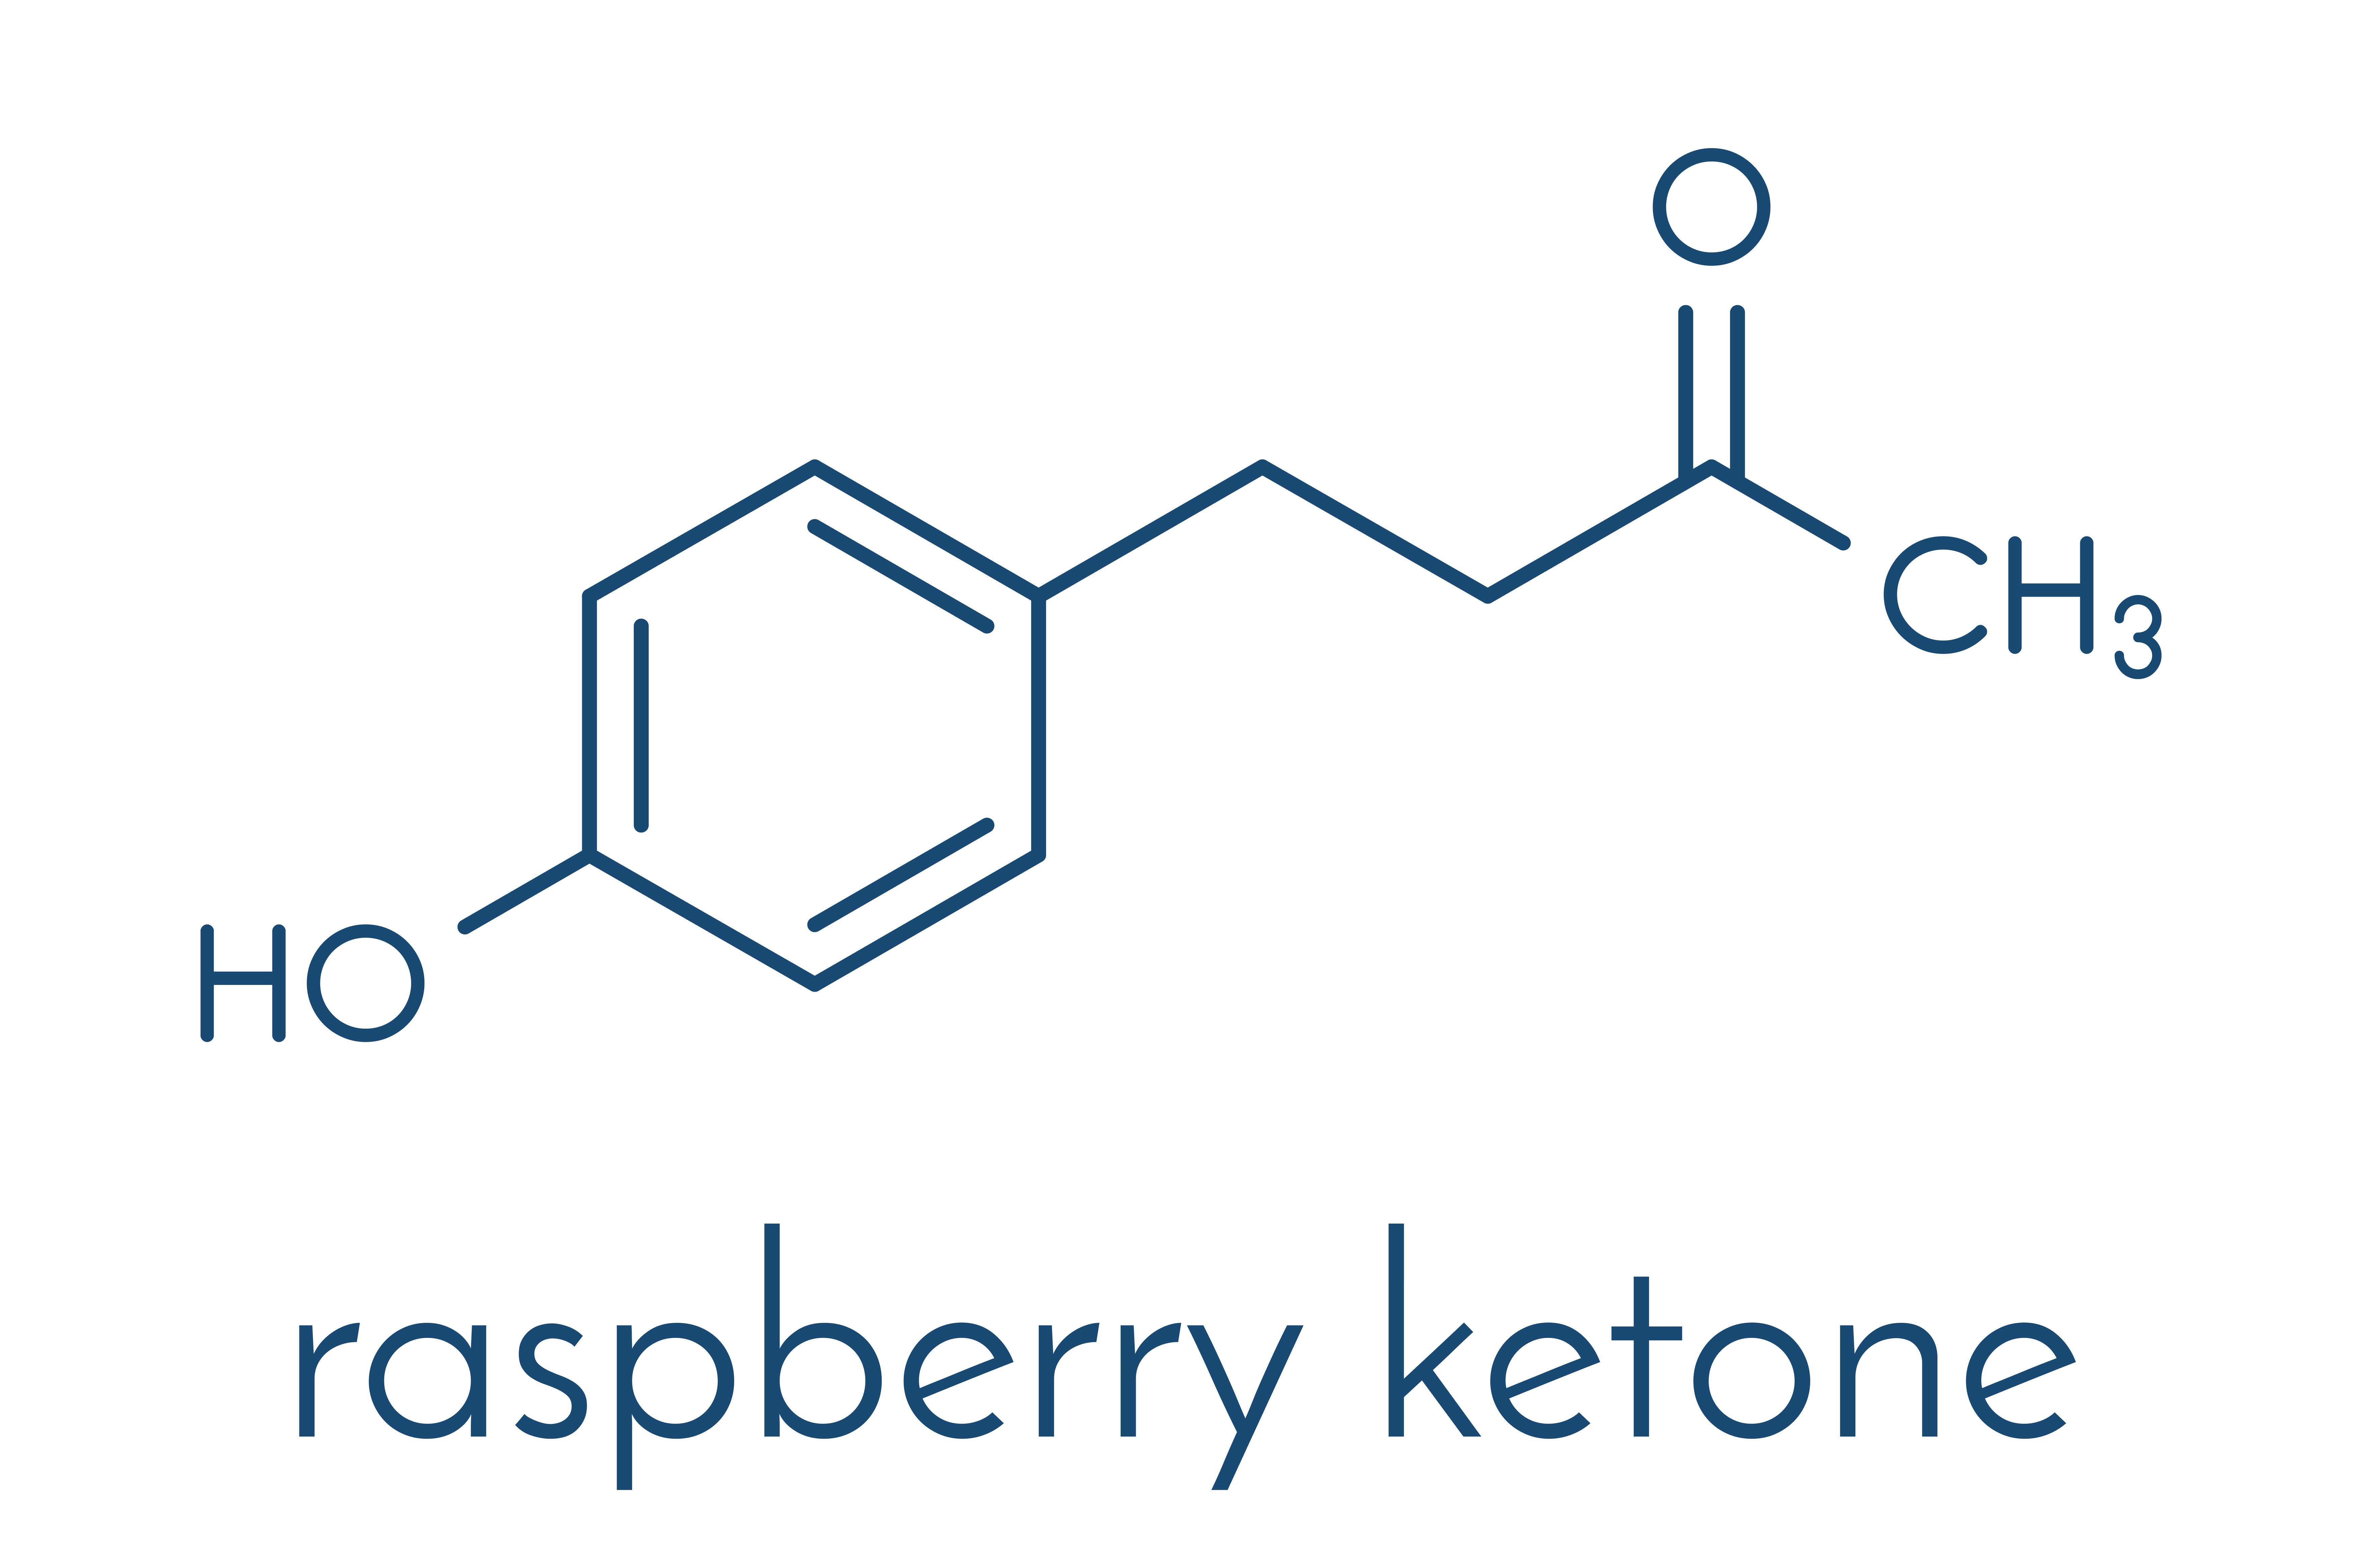 How does raspberry ketones look like? Here is chemical formula of those!